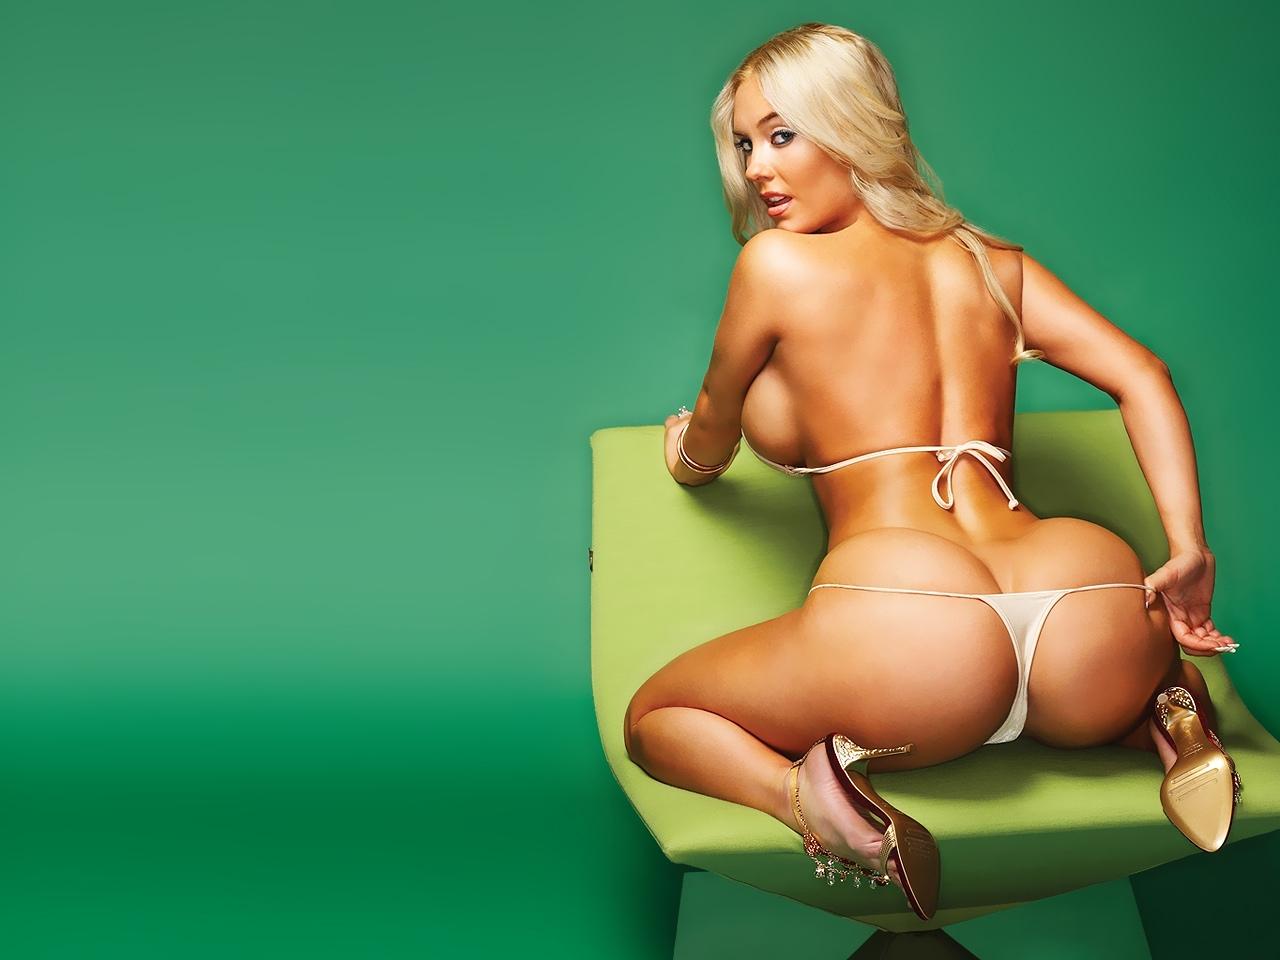 Coco austin booty xxx, funny sex nudes